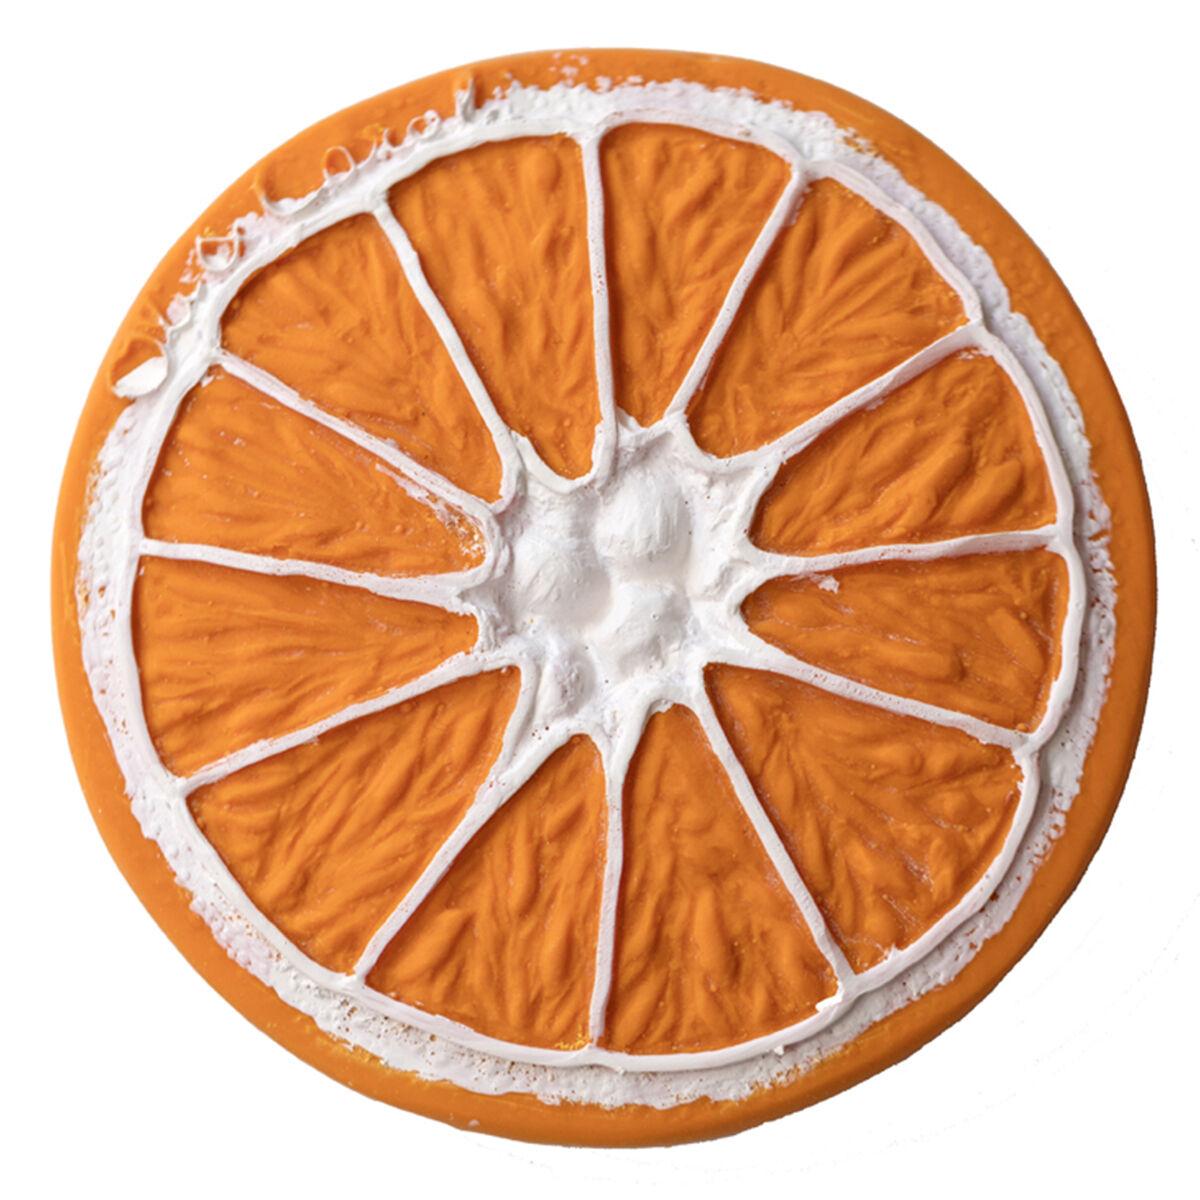 Oli & Carol Jouet de Dentition Clementino l'Orange